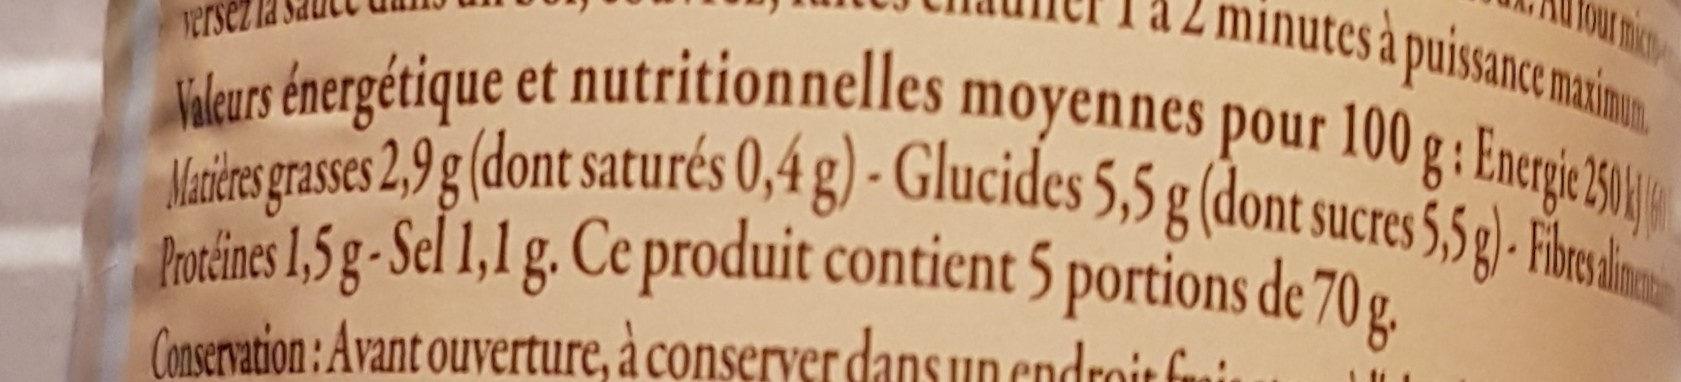 Sauce Provençale - Información nutricional - fr